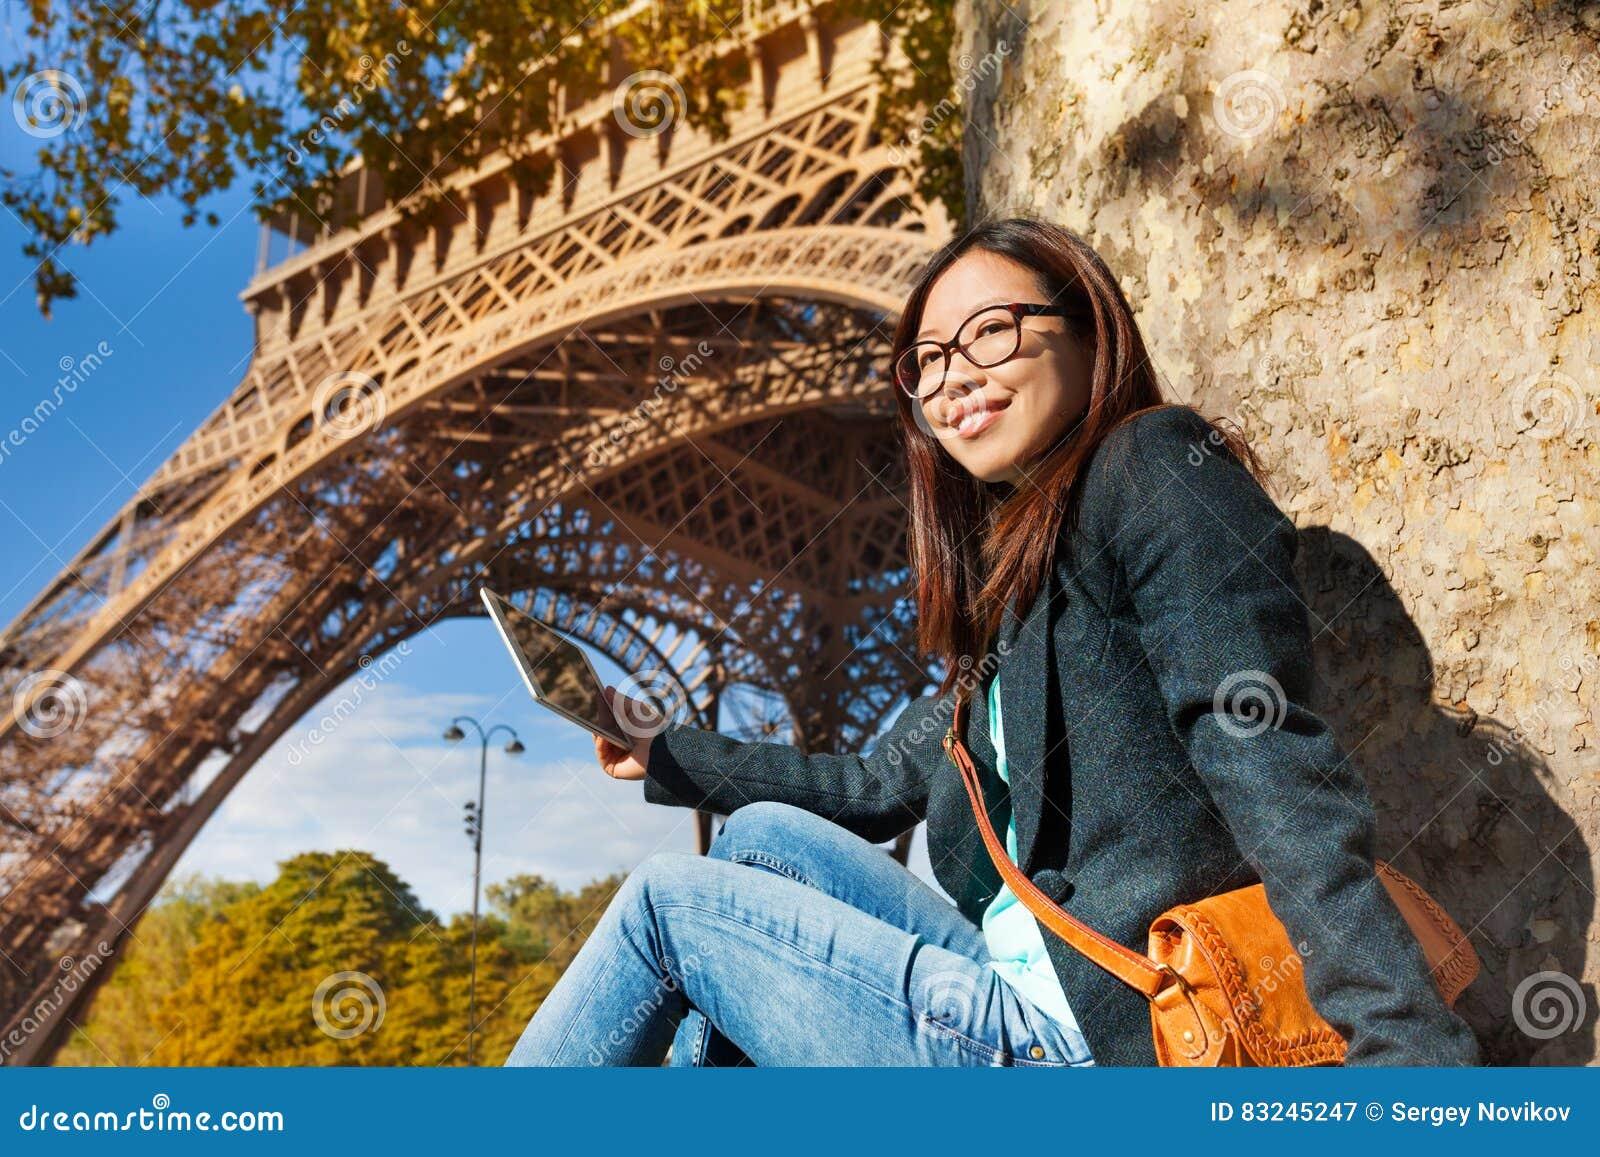 Beautiful young woman taking photo of Eiffel Tower